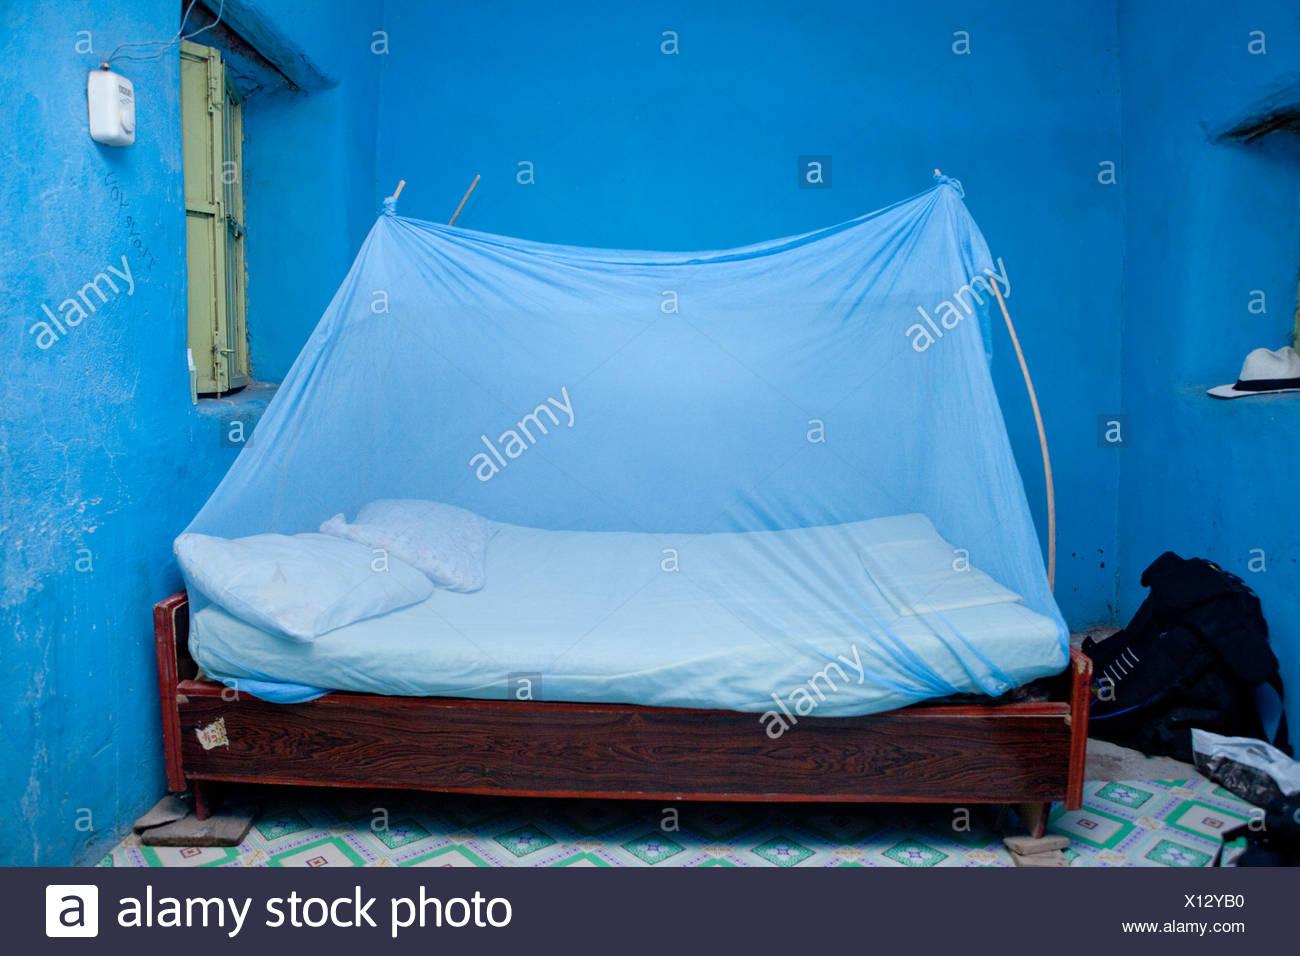 Hotel, Asaita, Africa, bed, mosquito net, mosquito net, primitive, hotel, Ethiopia, - Stock Image